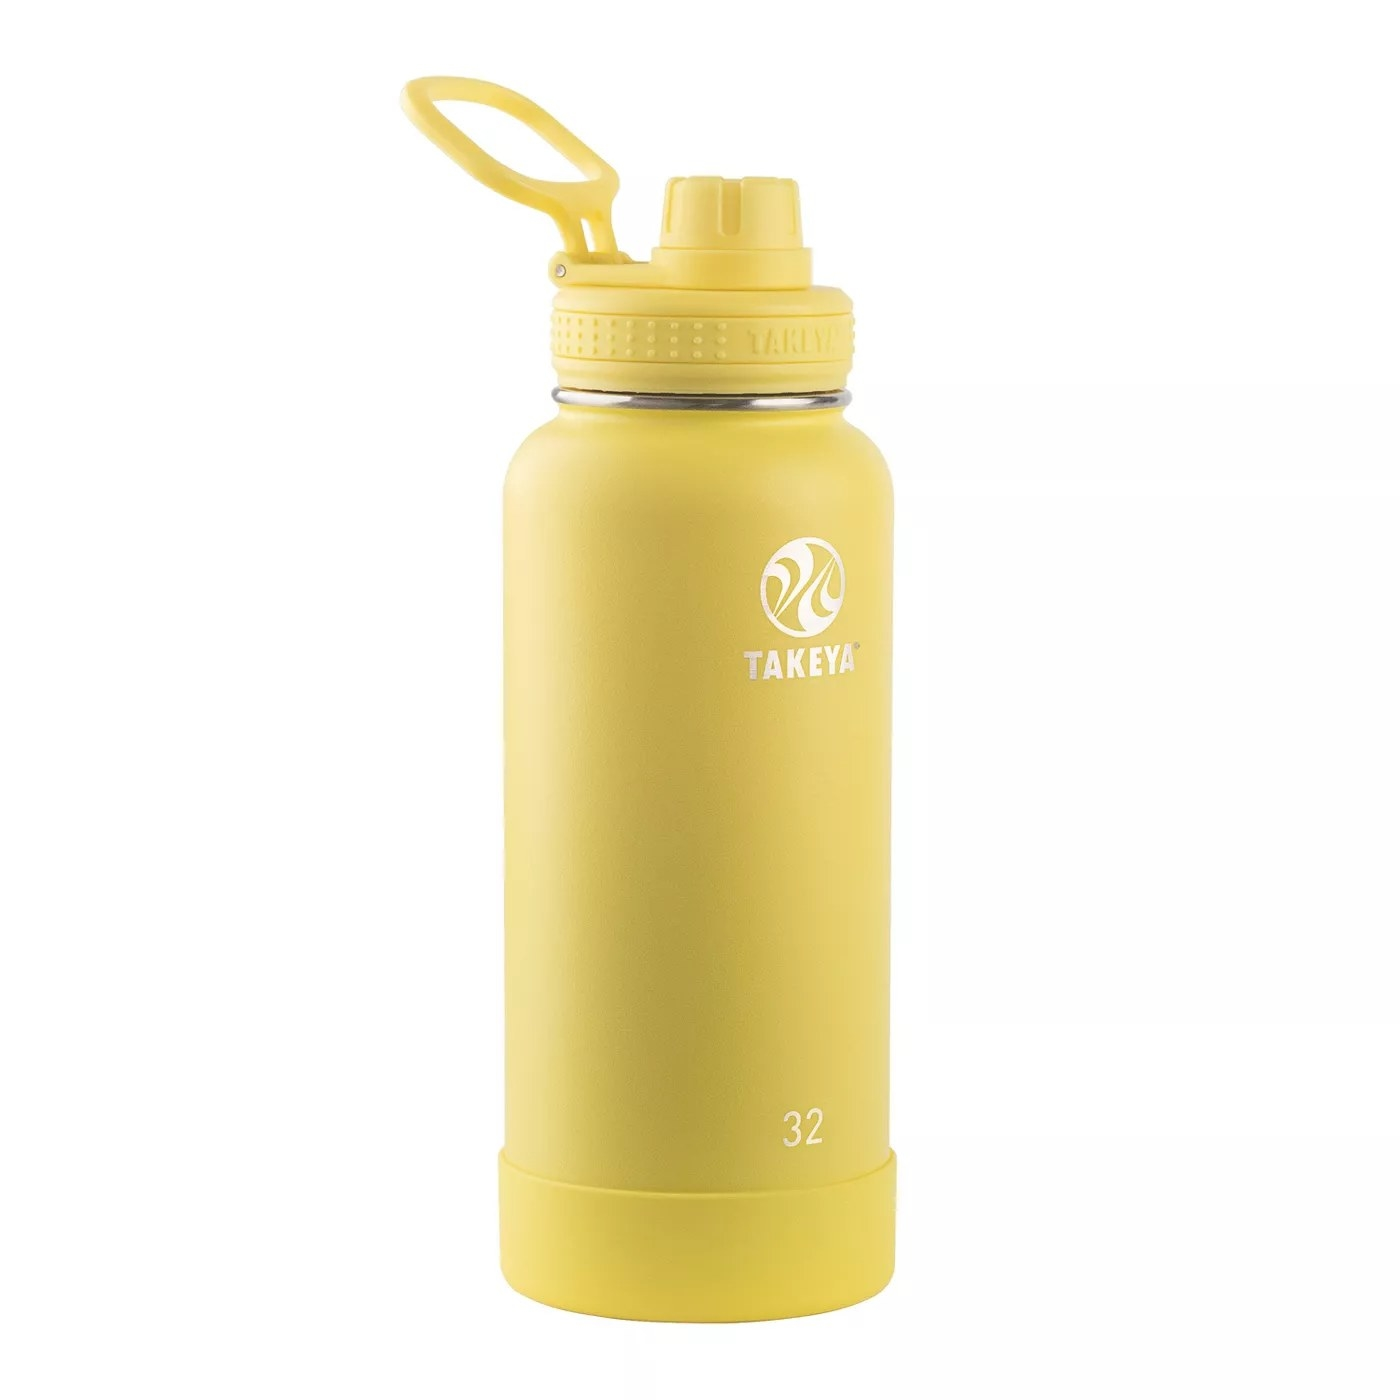 Yellow Takeya water bottle